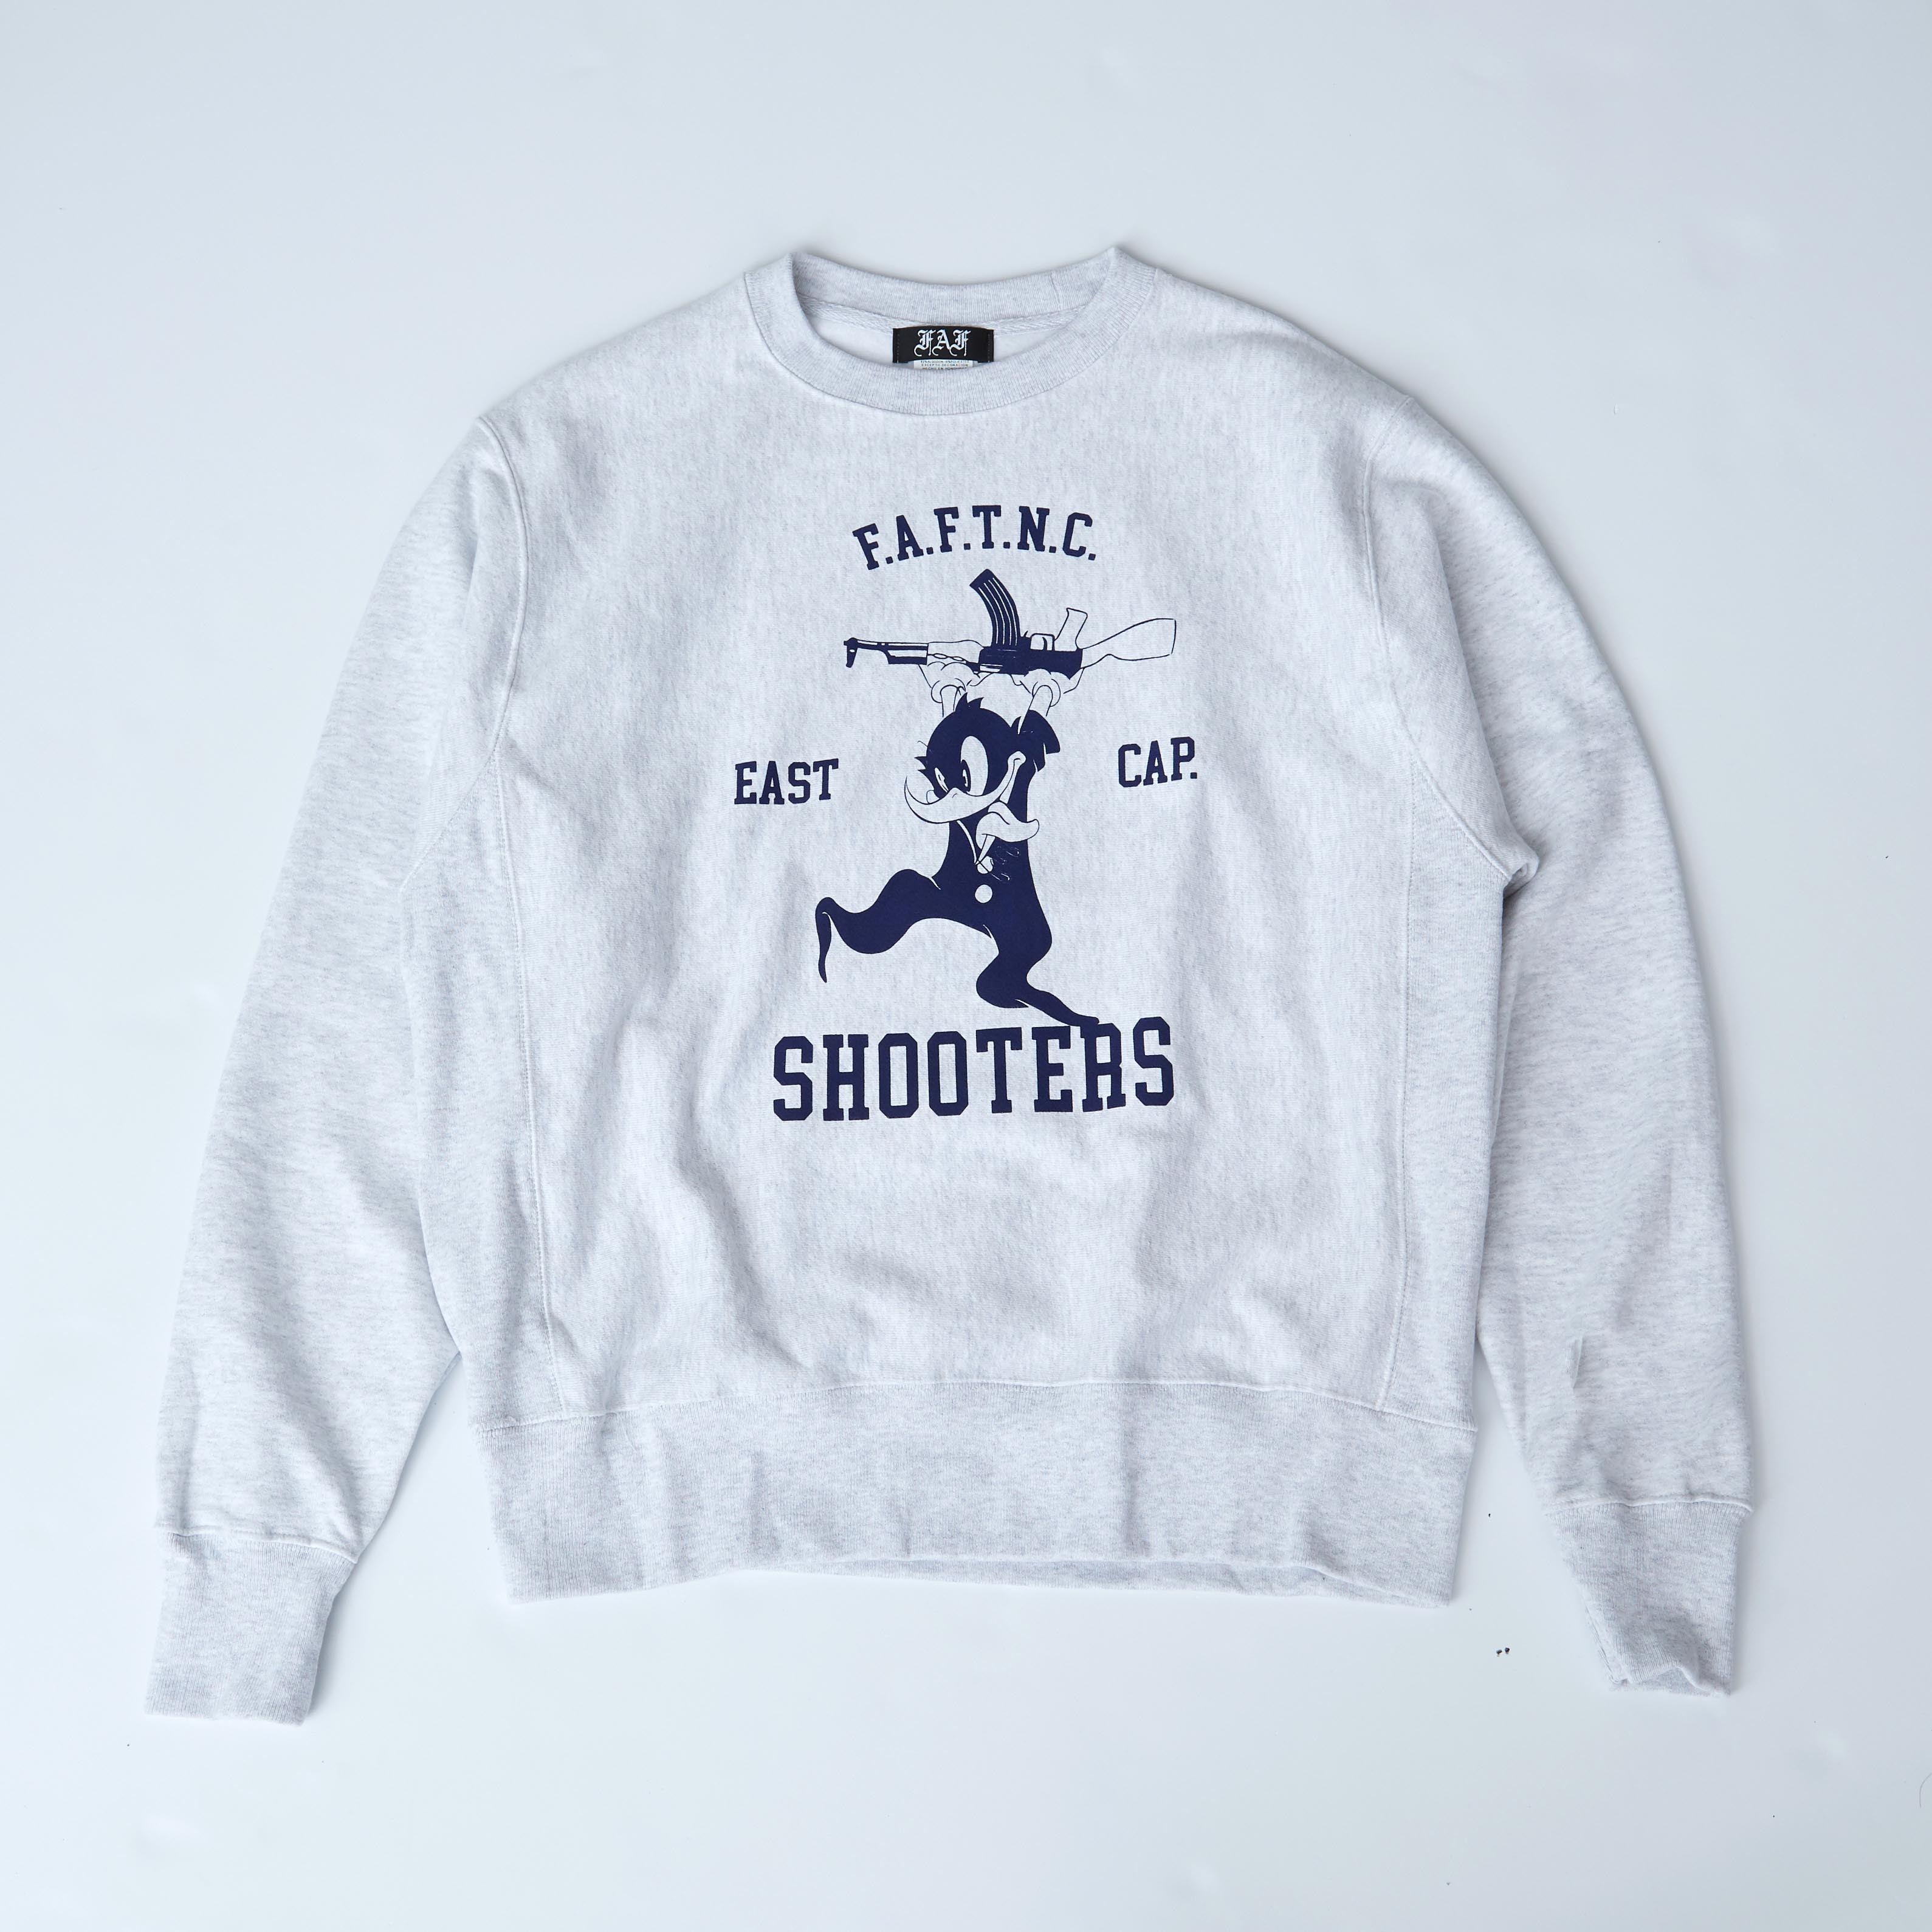 FAFTNC SHOOTERS CREWNECK / GRAY - 画像1